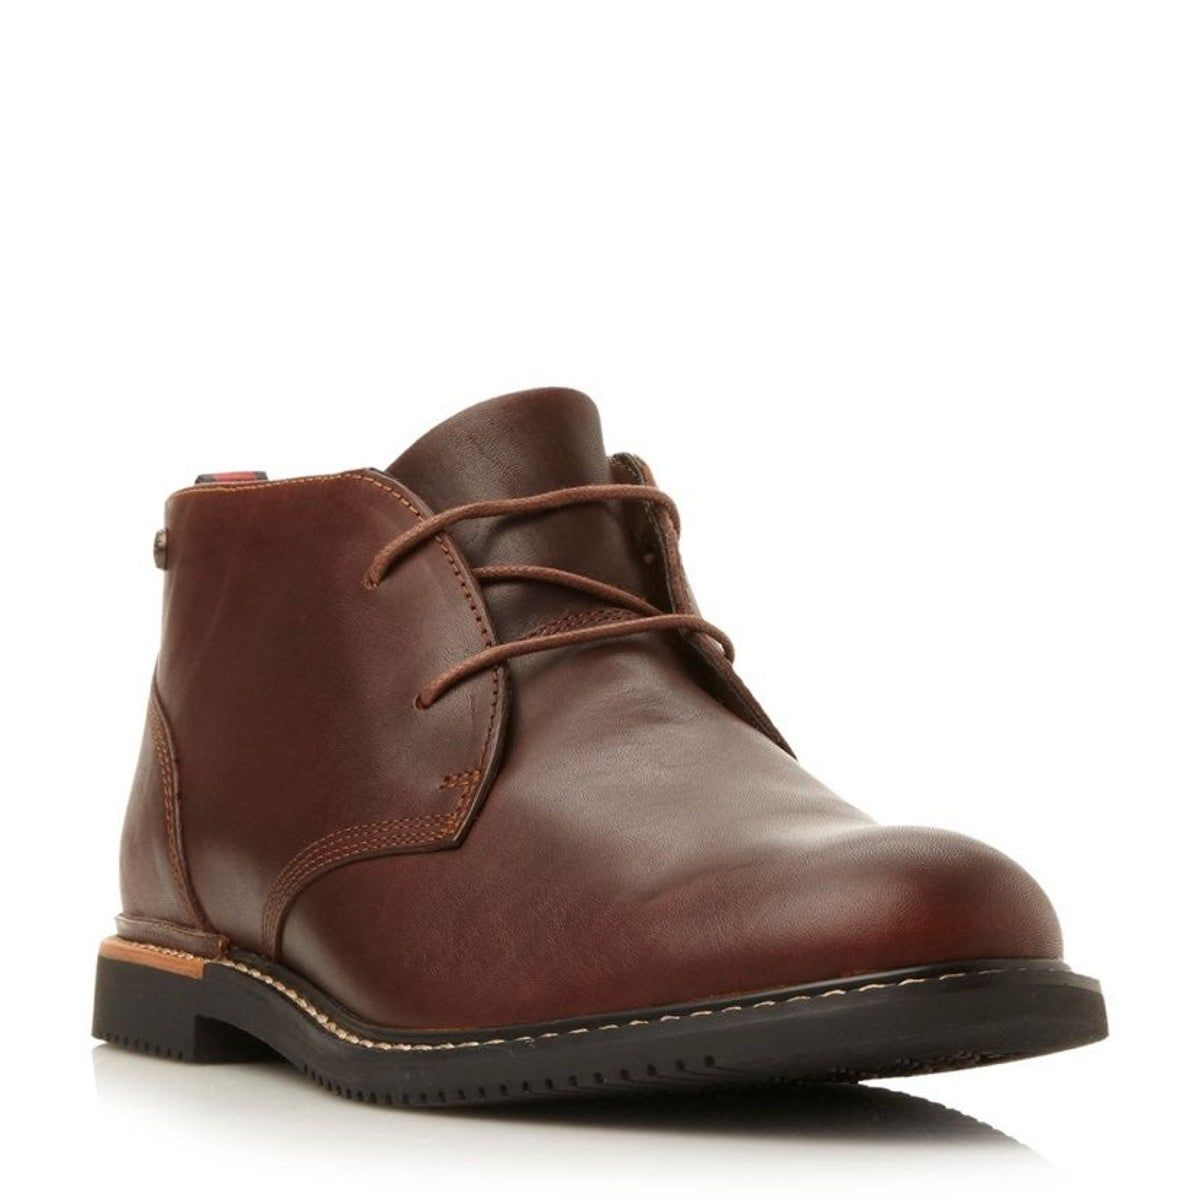 Men'S Brook Park Leather Chukka Shoes